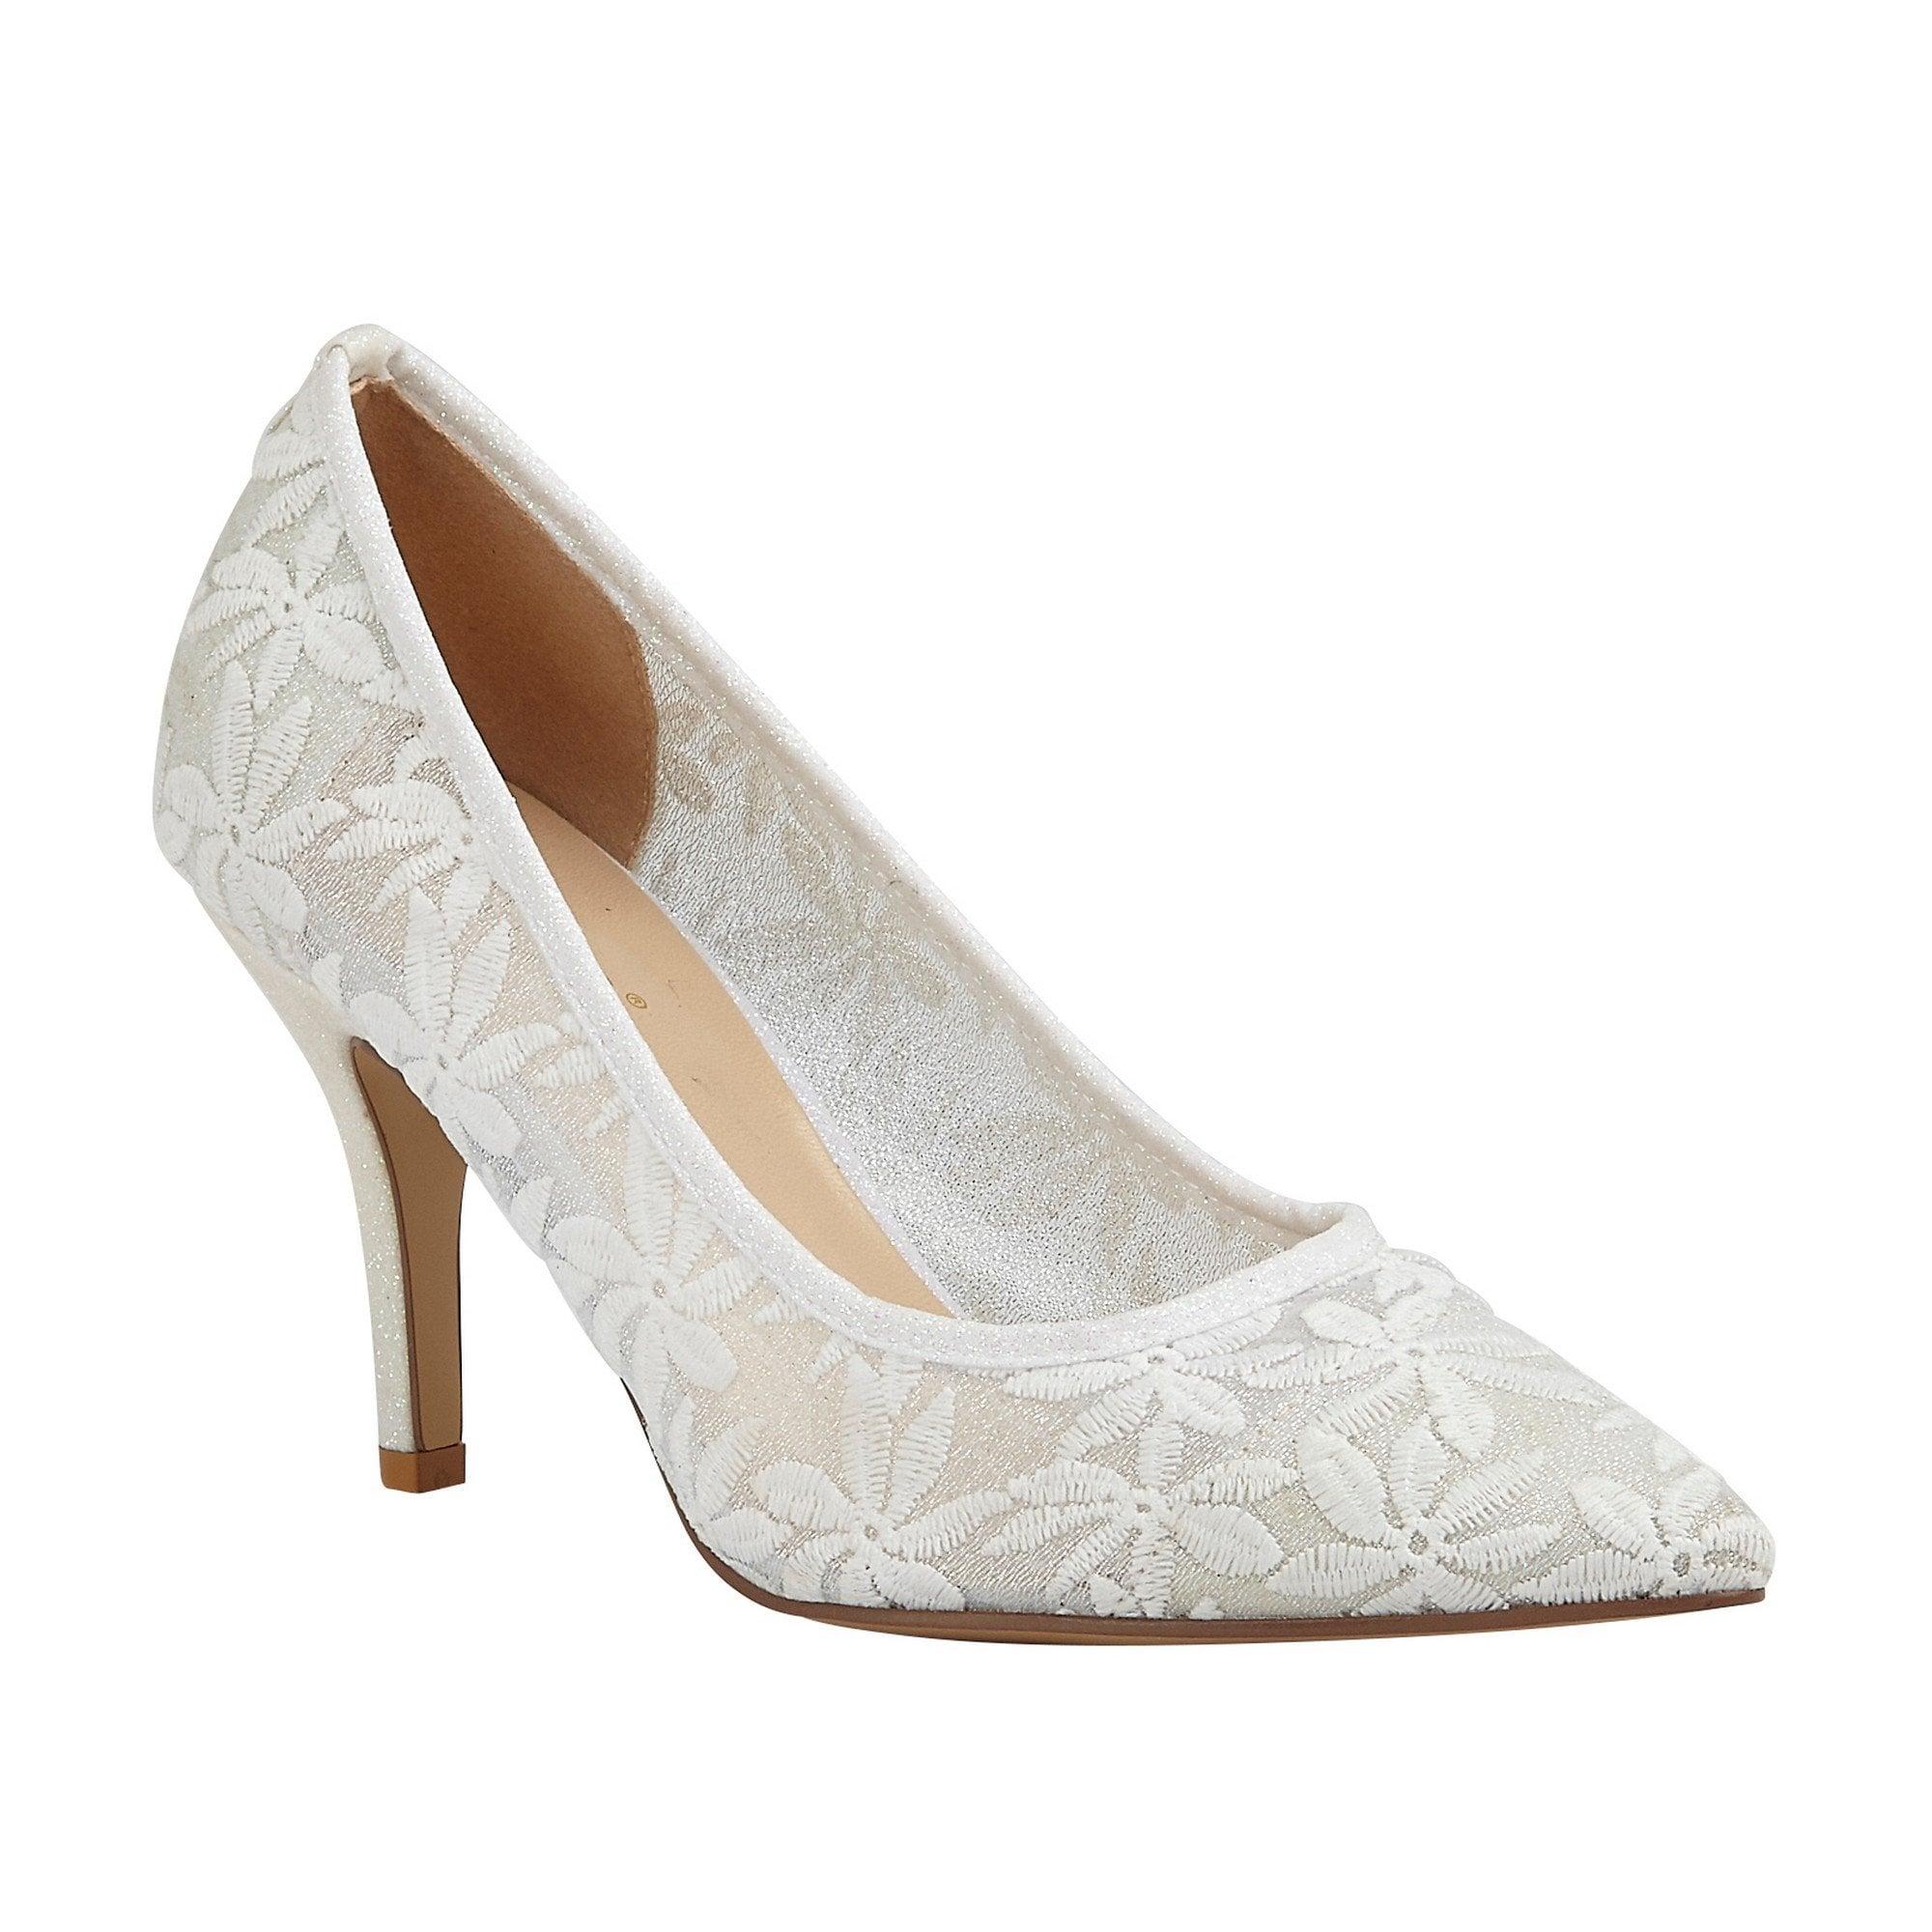 Lotus ladies' Briony court shoe